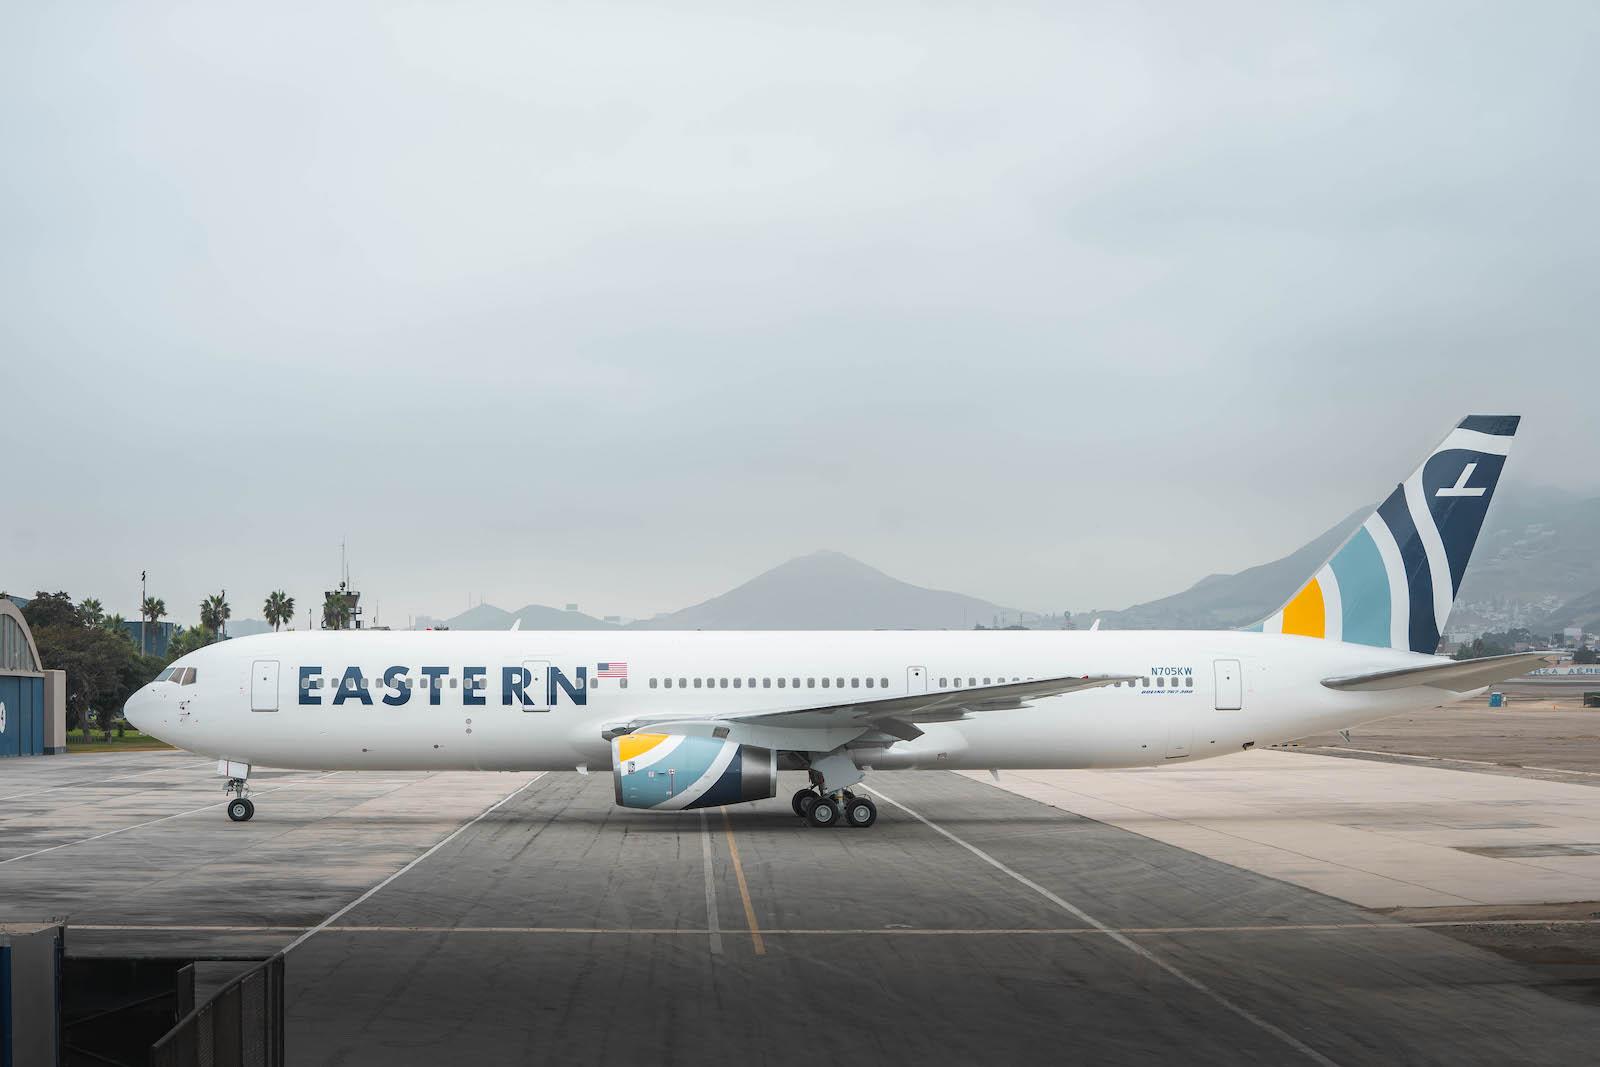 Eastern Airlines od maja uvodi direktan let na liniji Čikago - Sarajevo